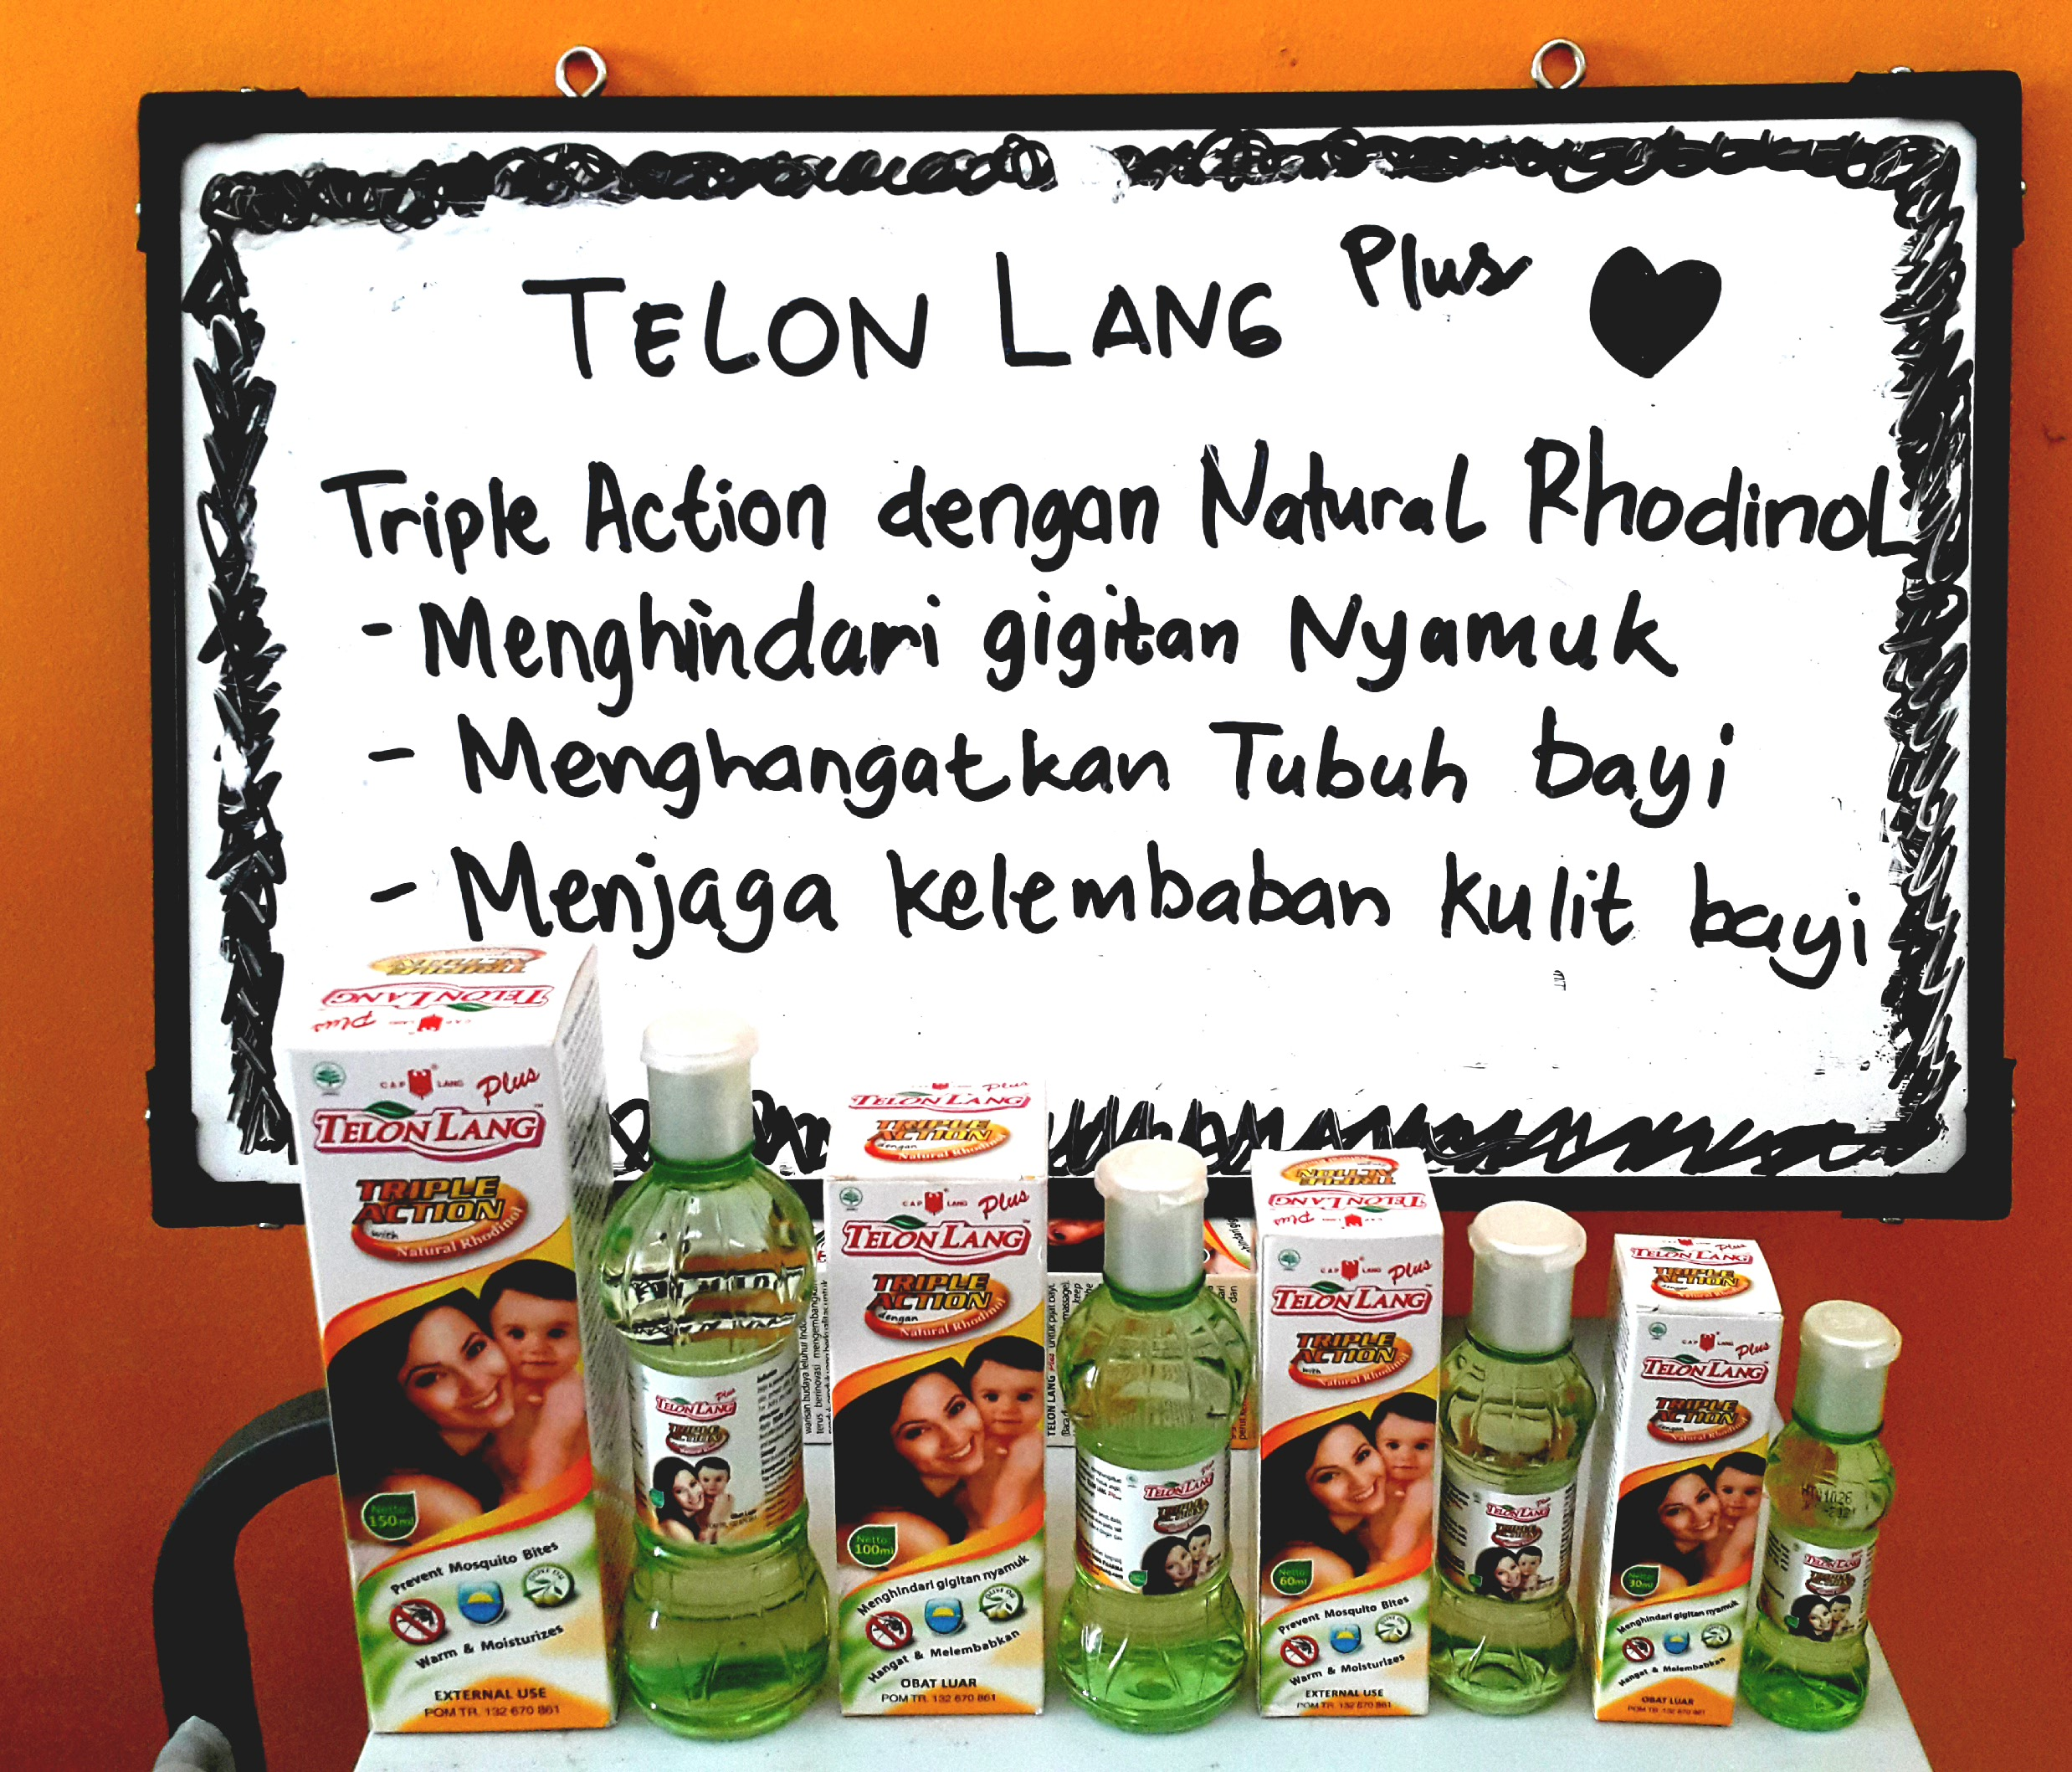 Telon Lang Plus terdiri dari 30ml, 60ml, 100ml dan 150ml melindungi keluarga dari gigitan nyamuk